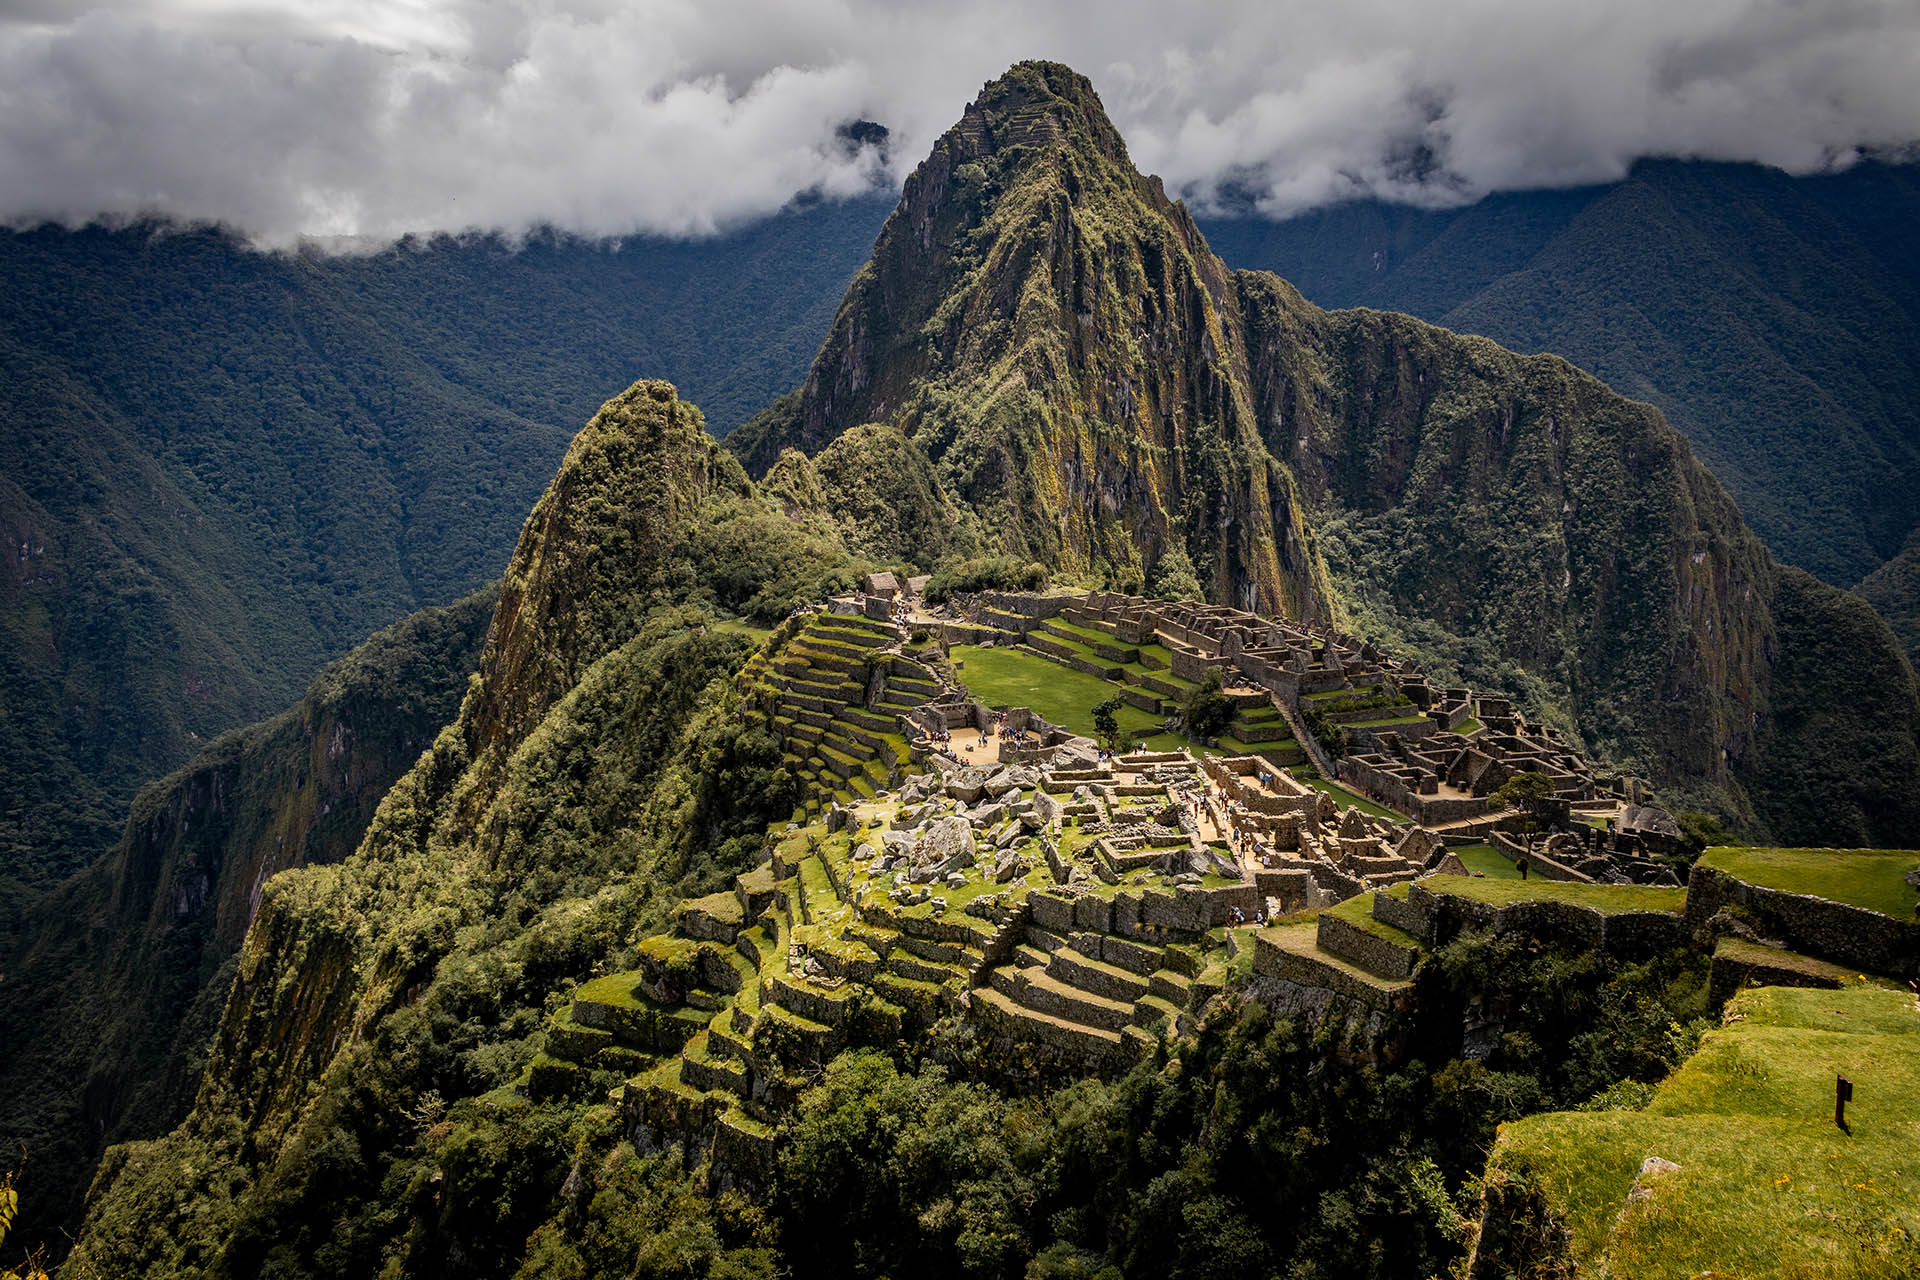 Uitzicht over Machu Picchu vanaf de route richting Machu Picchu Mountain.